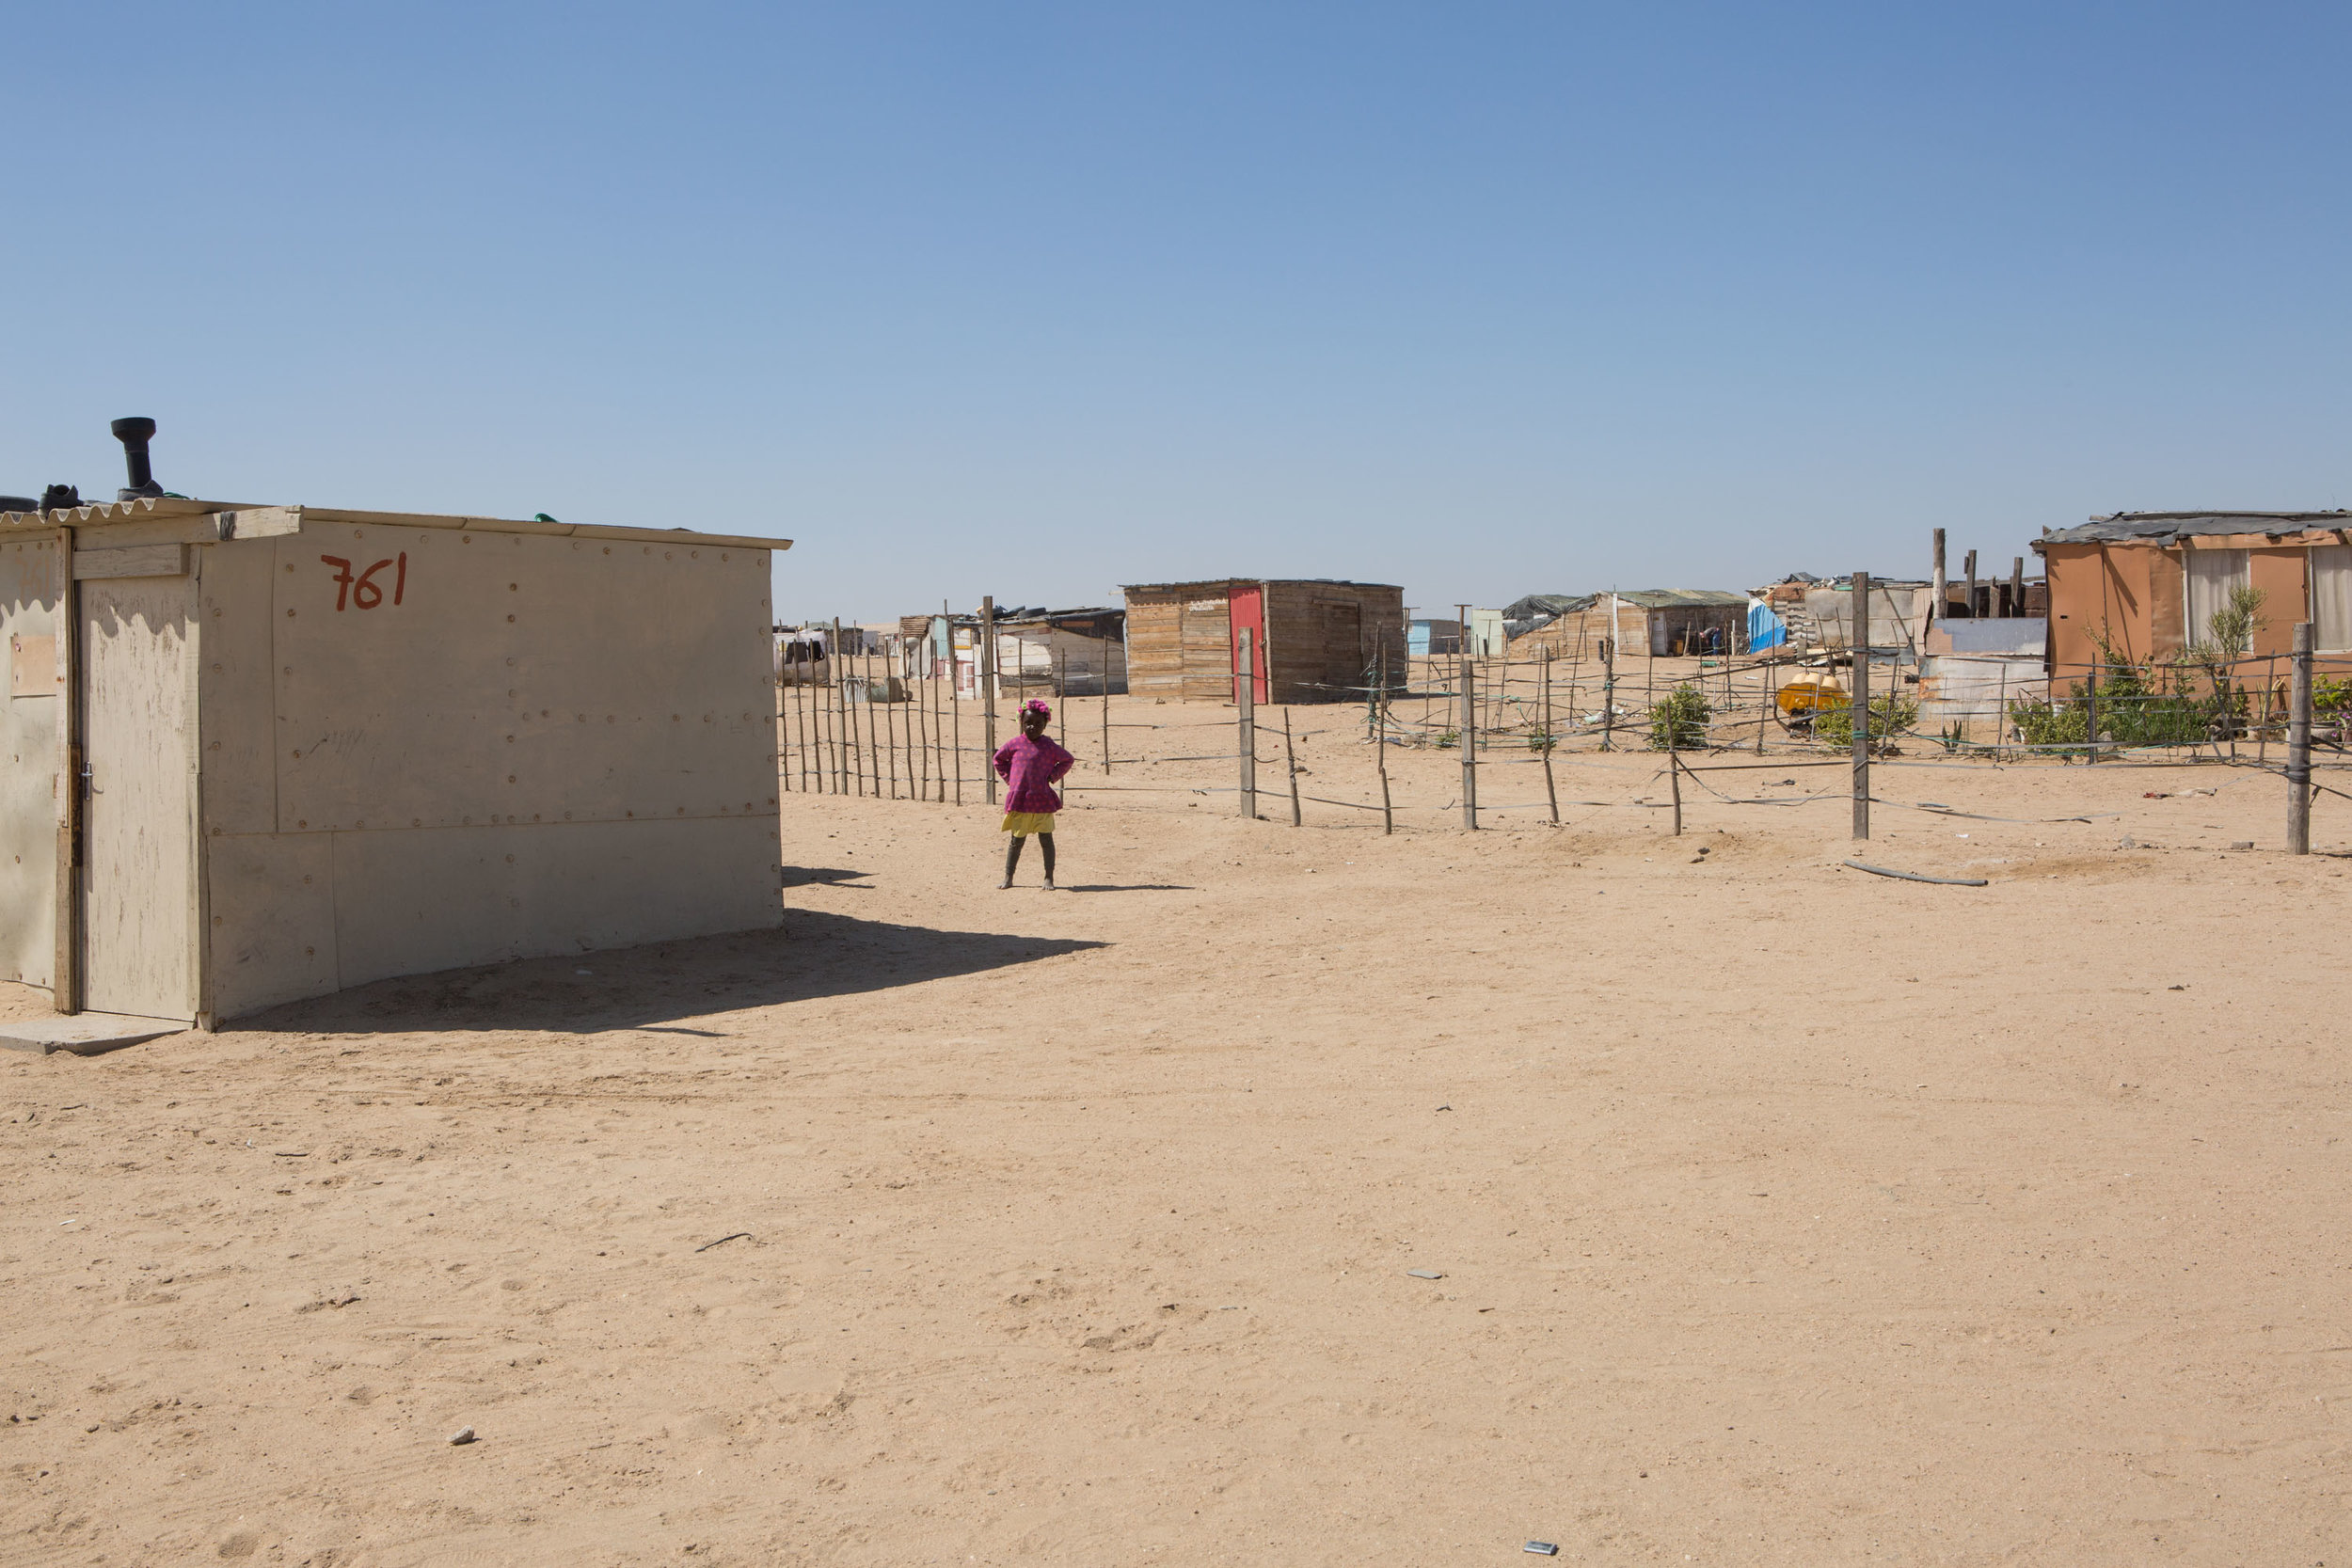 namibia - drc clinic - synergos 2014-171